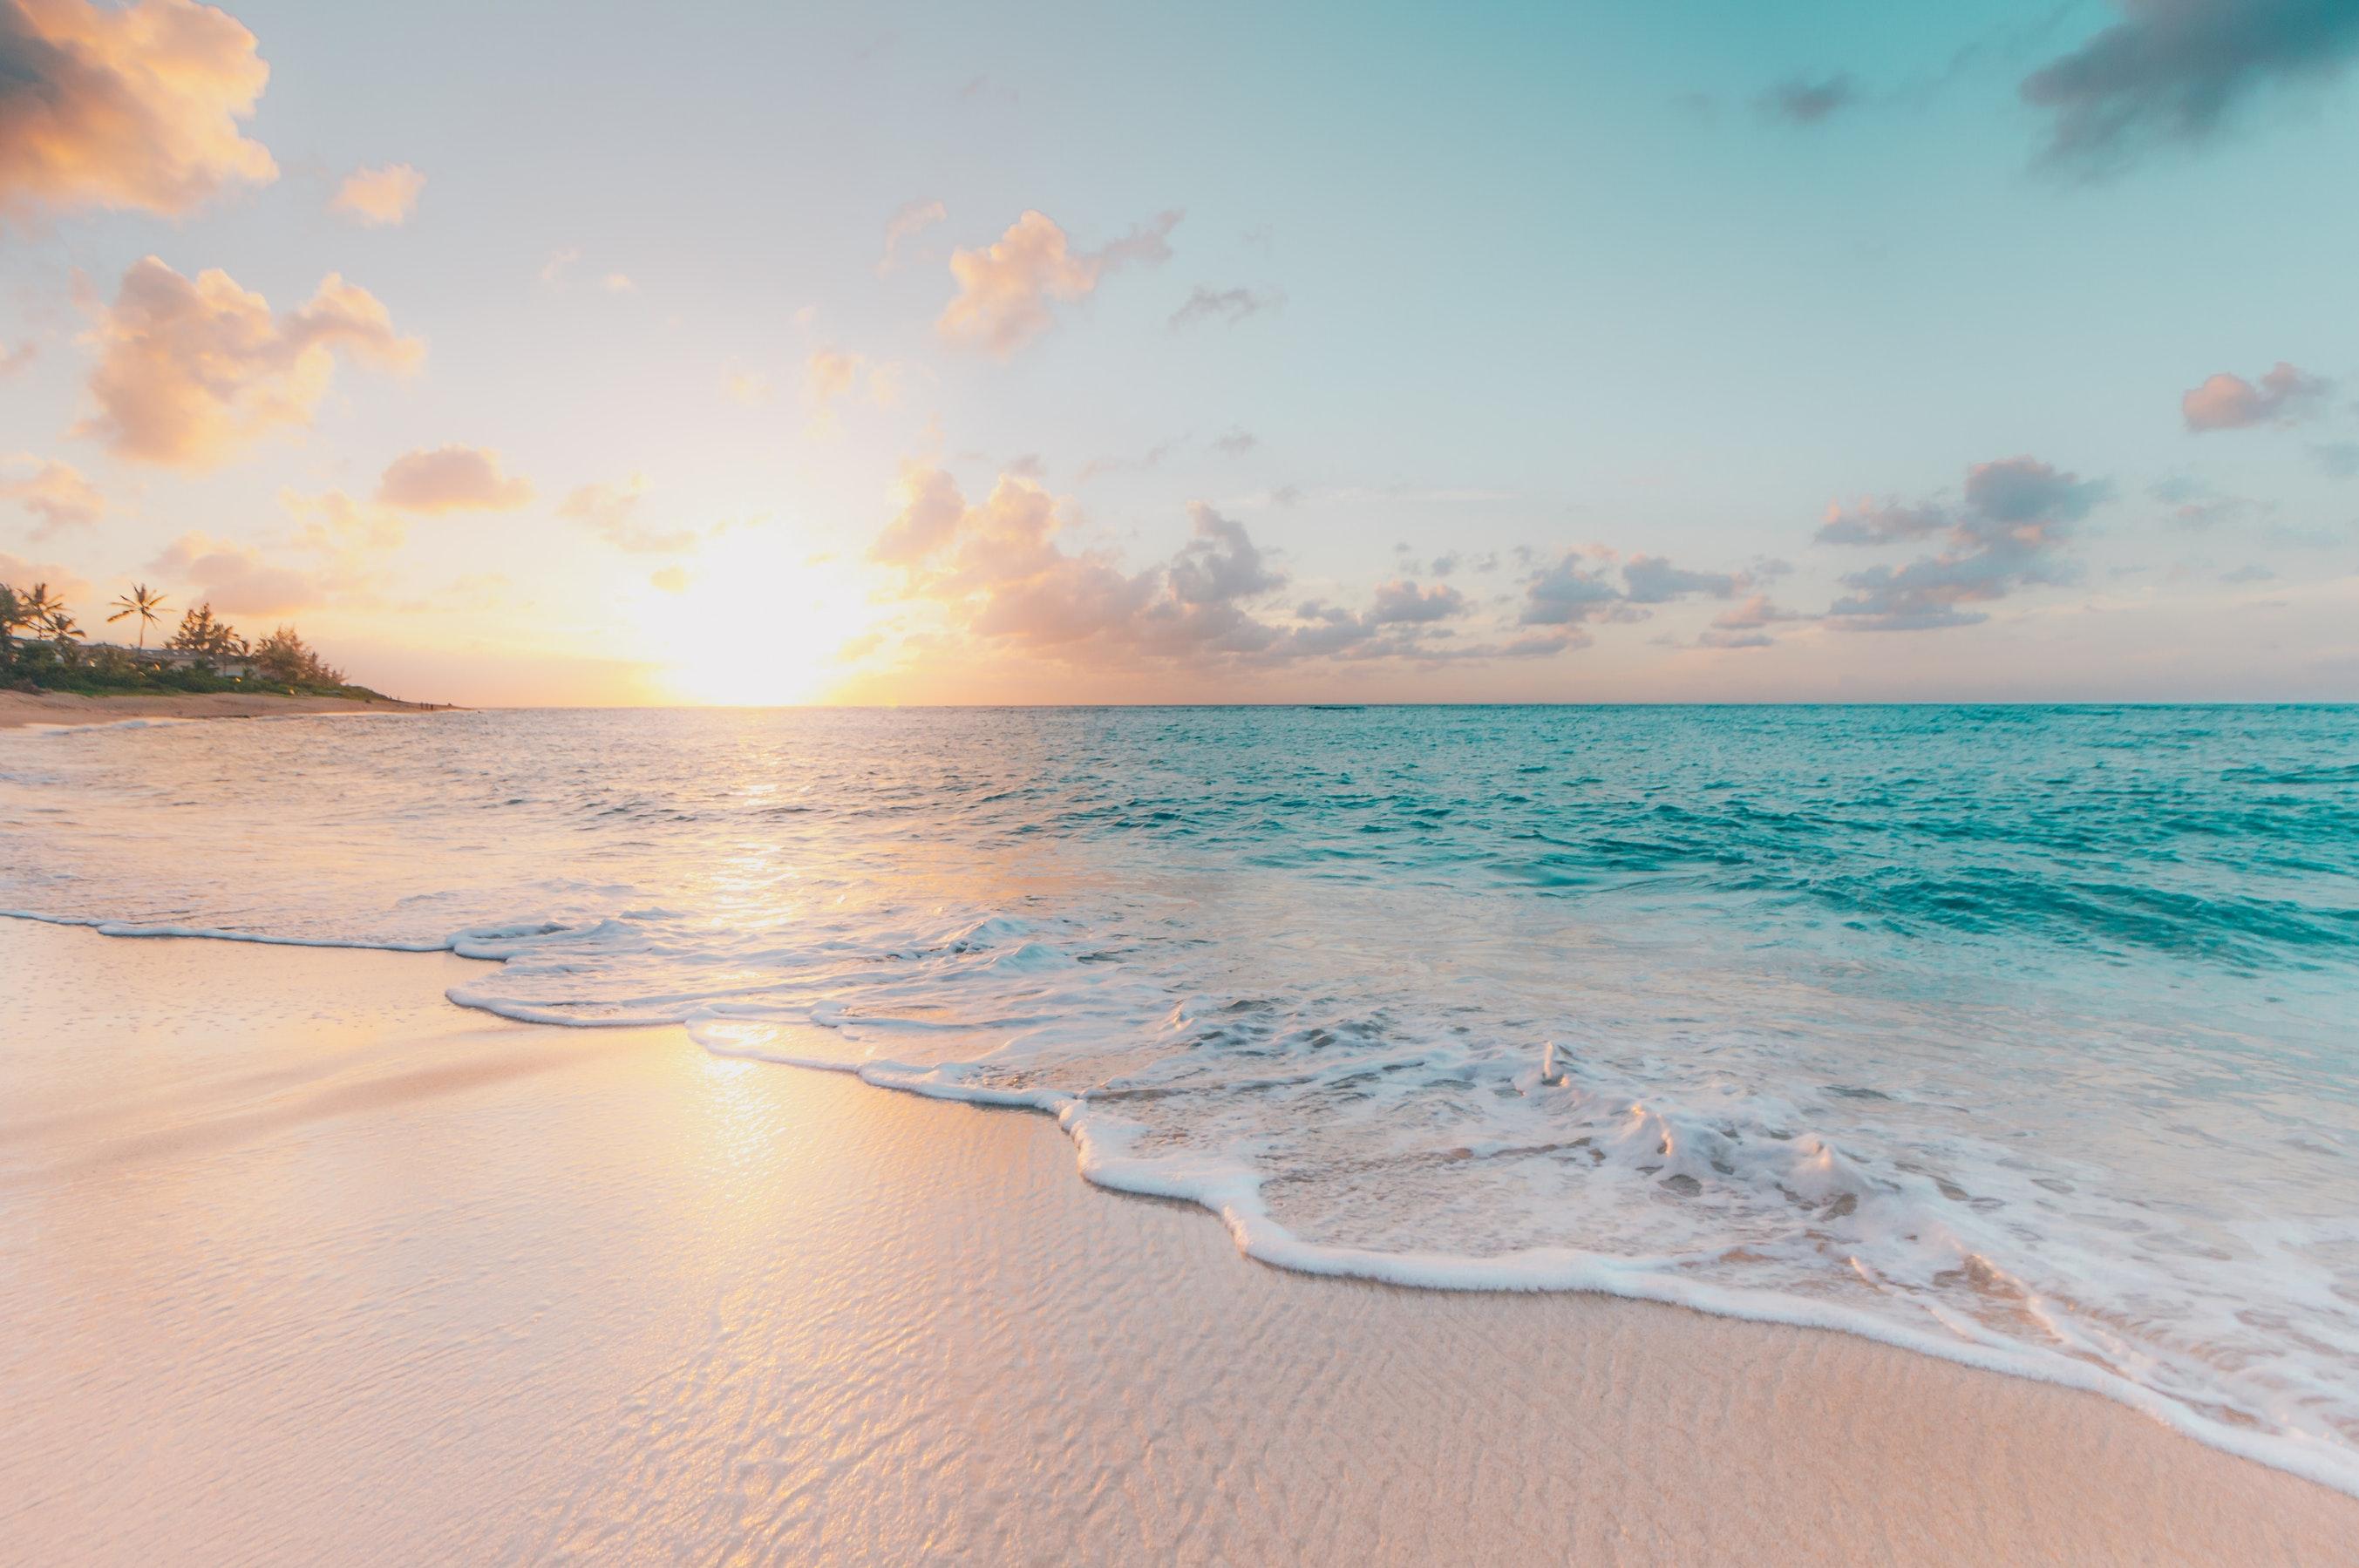 Sanibel Island bei Cape Coral